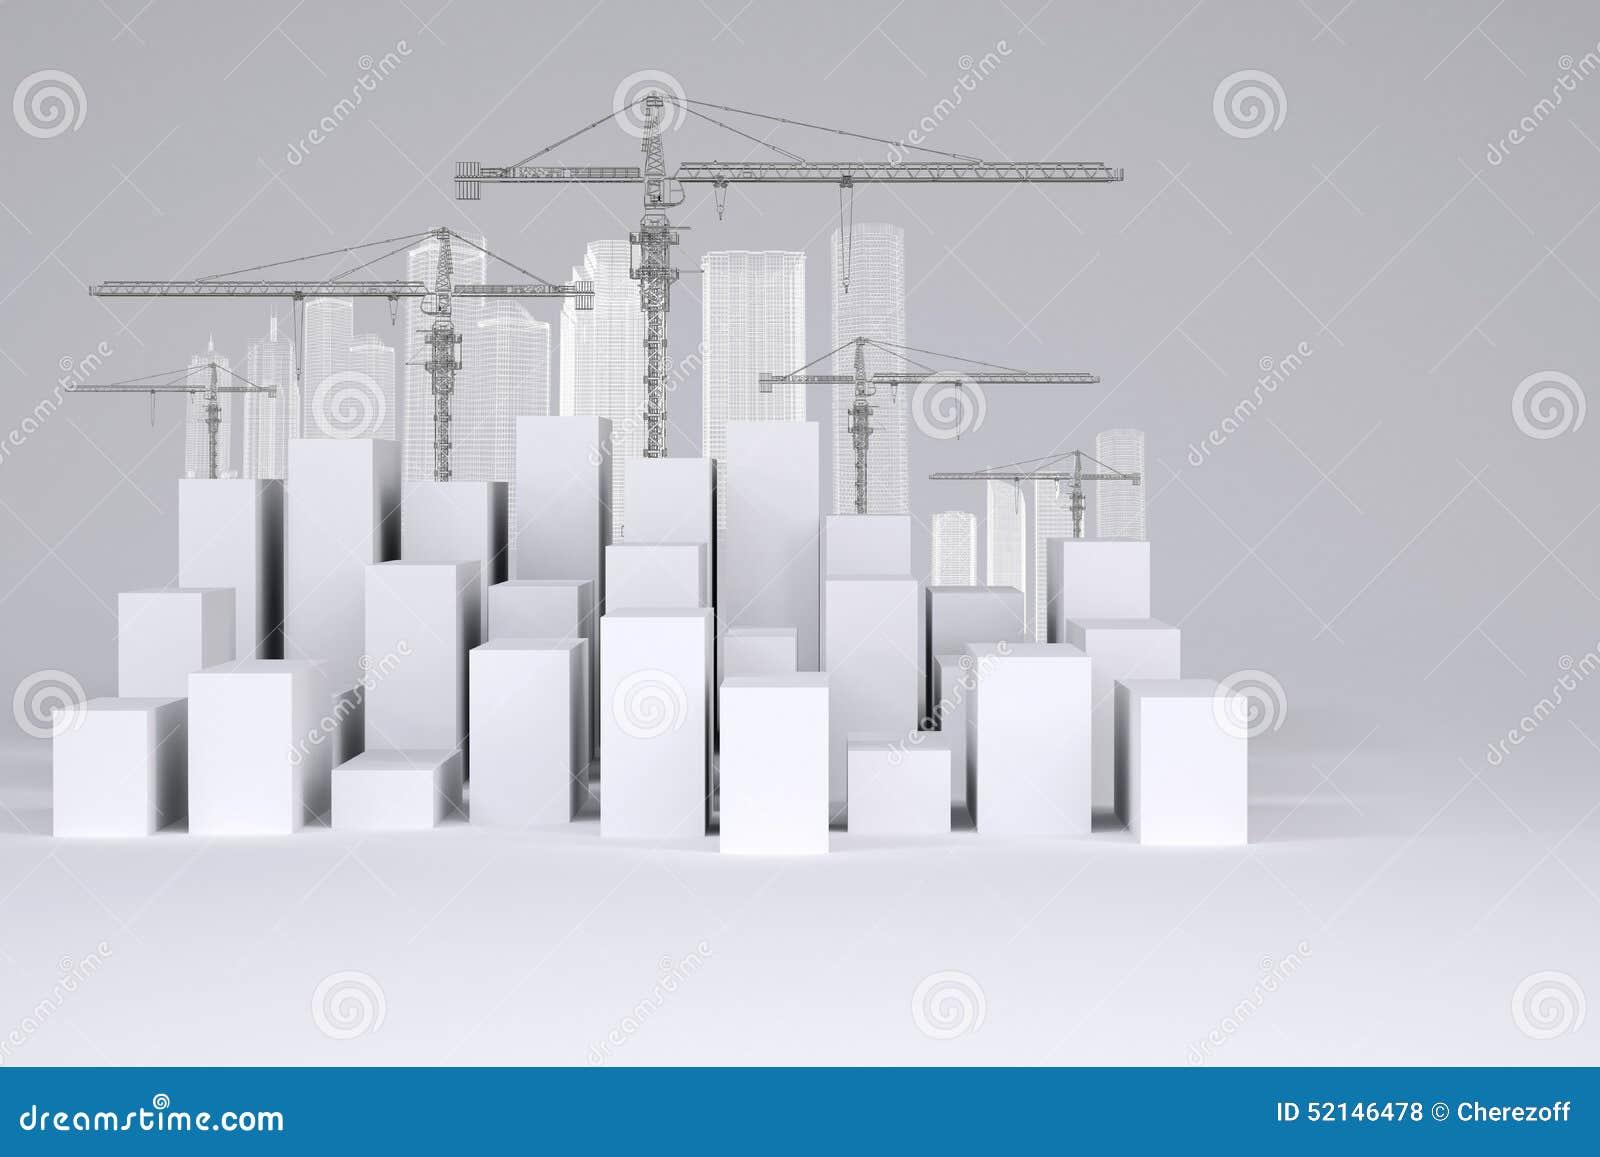 Fantastisch Quadratischer Drahtrahmen Bilder - Elektrische ...